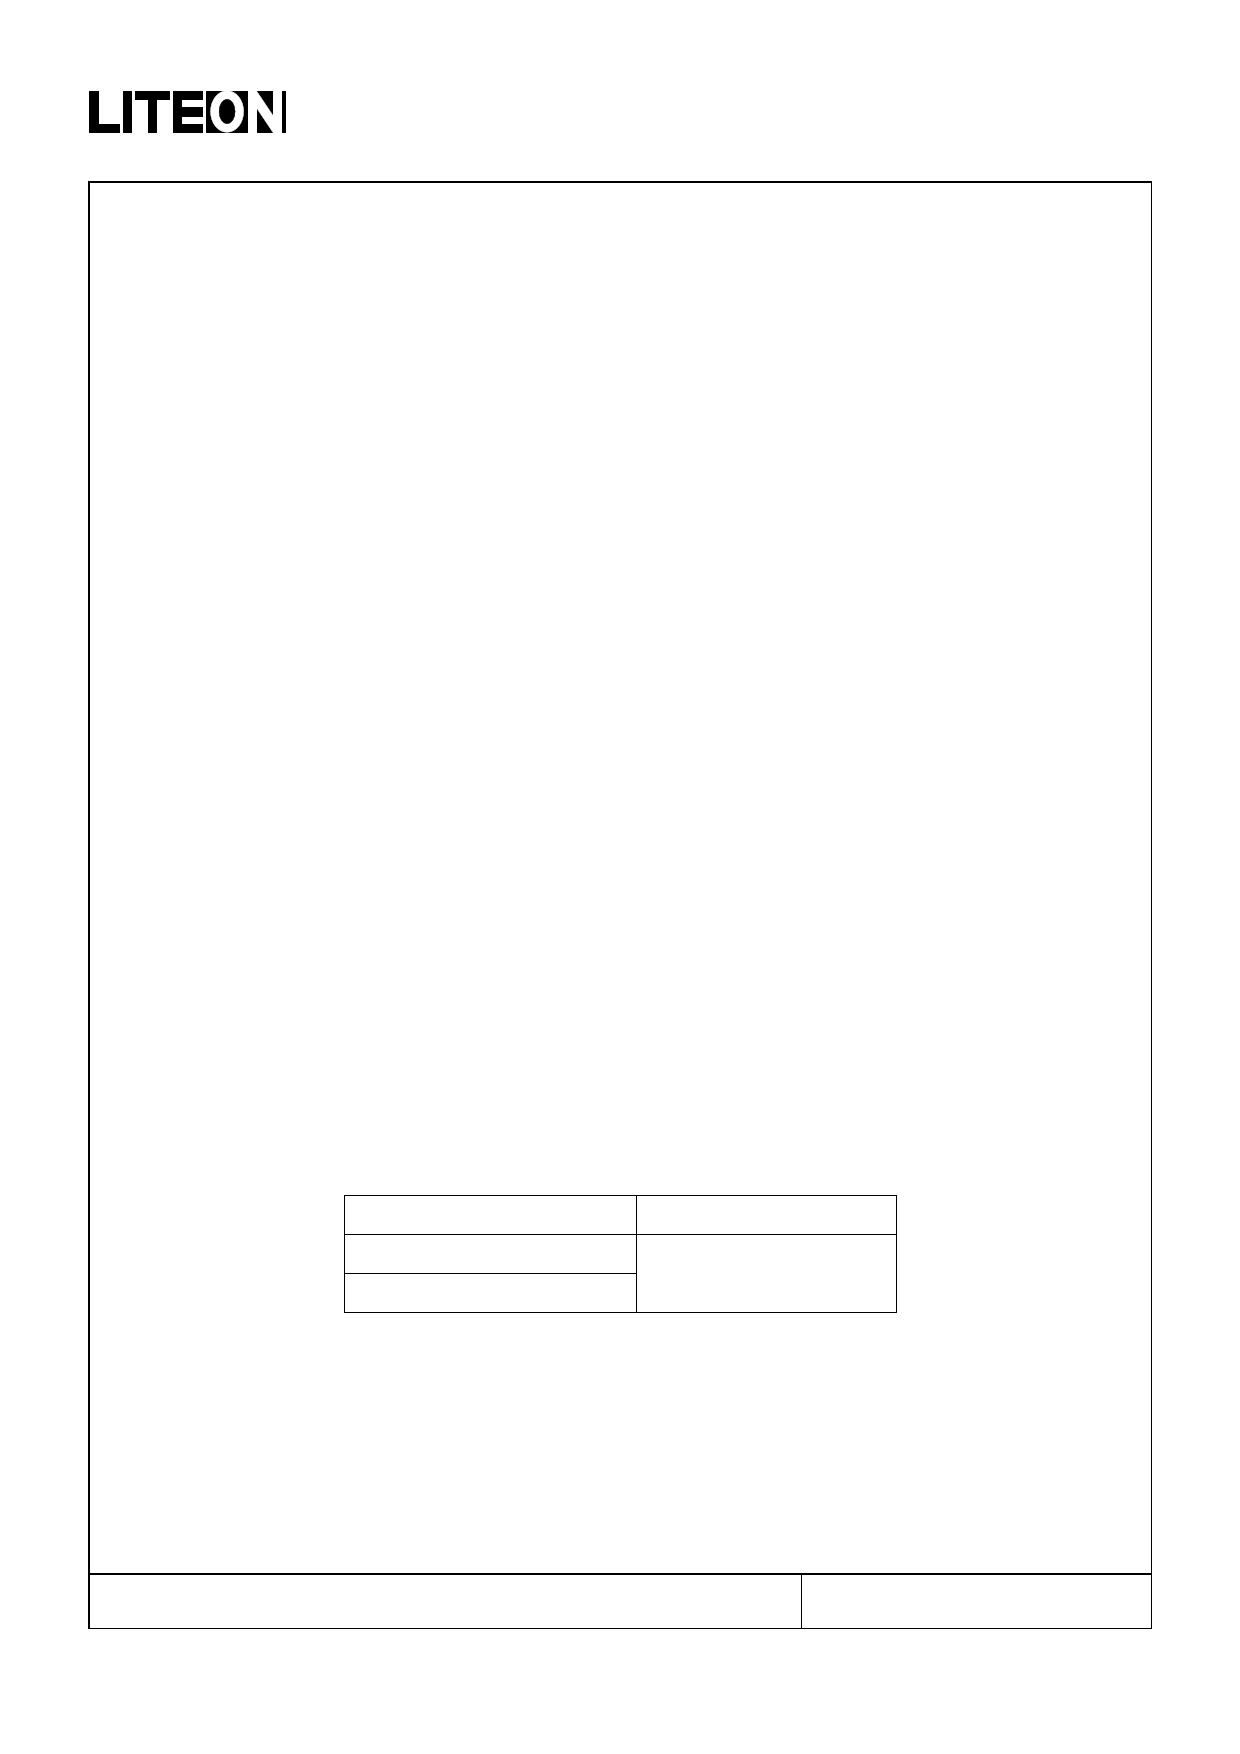 LTP-3157AC Datasheet